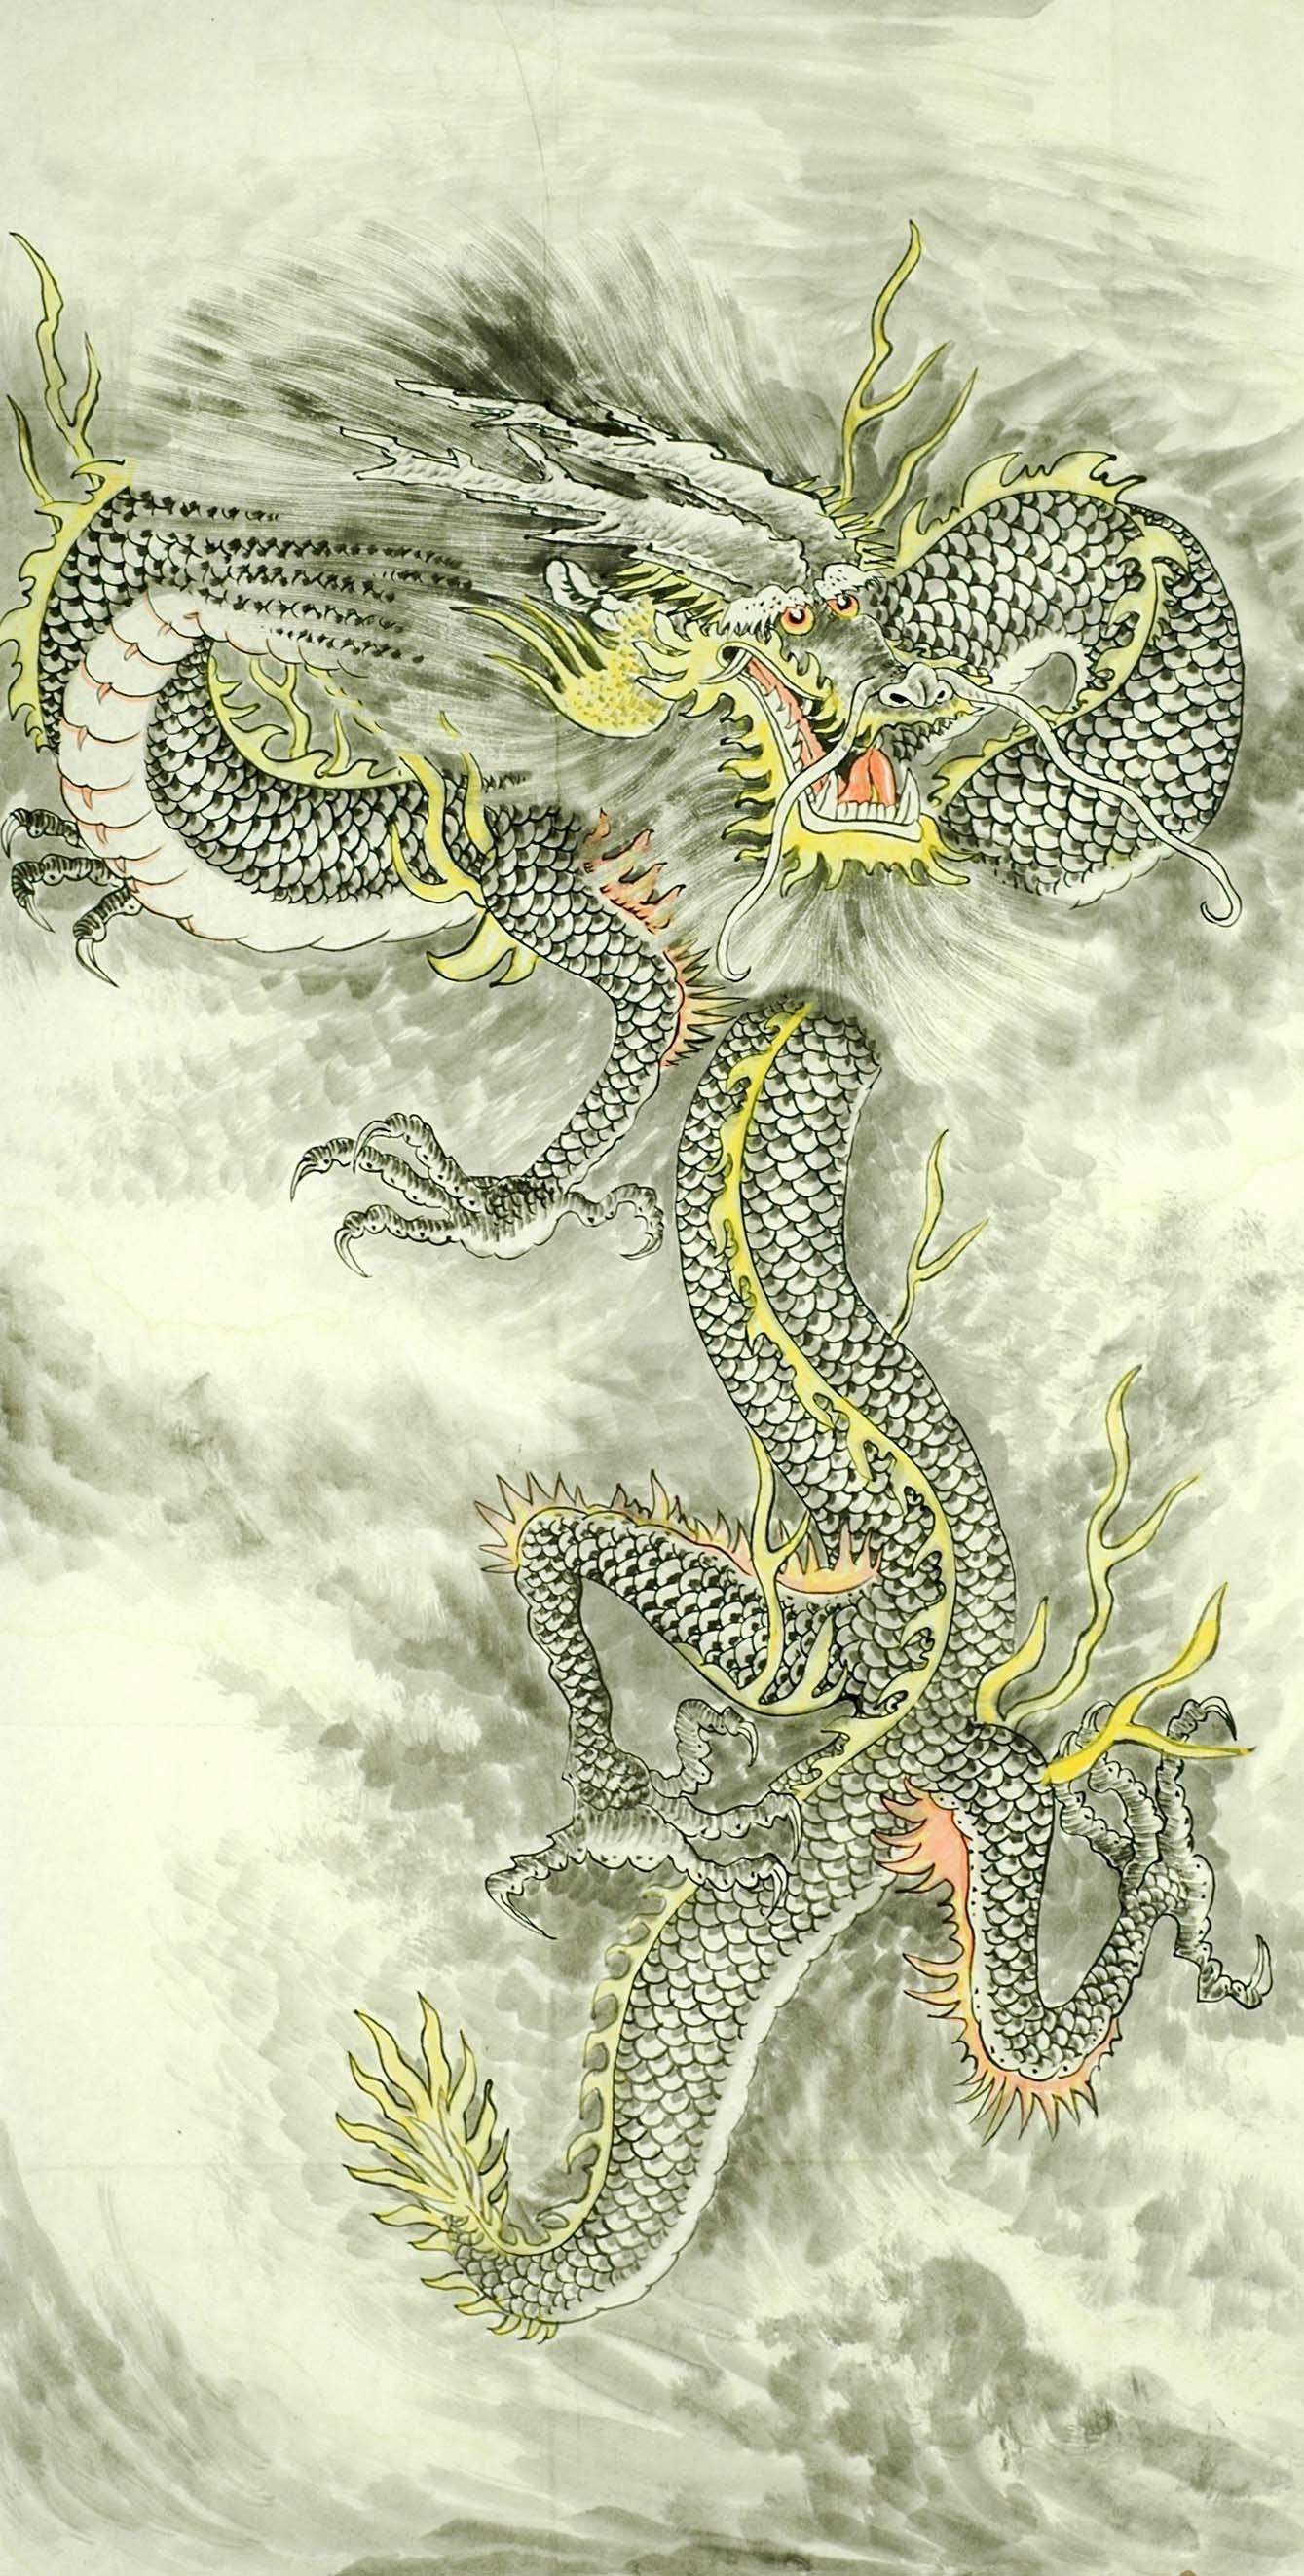 Chinese Dragon Painting - CNAG008725